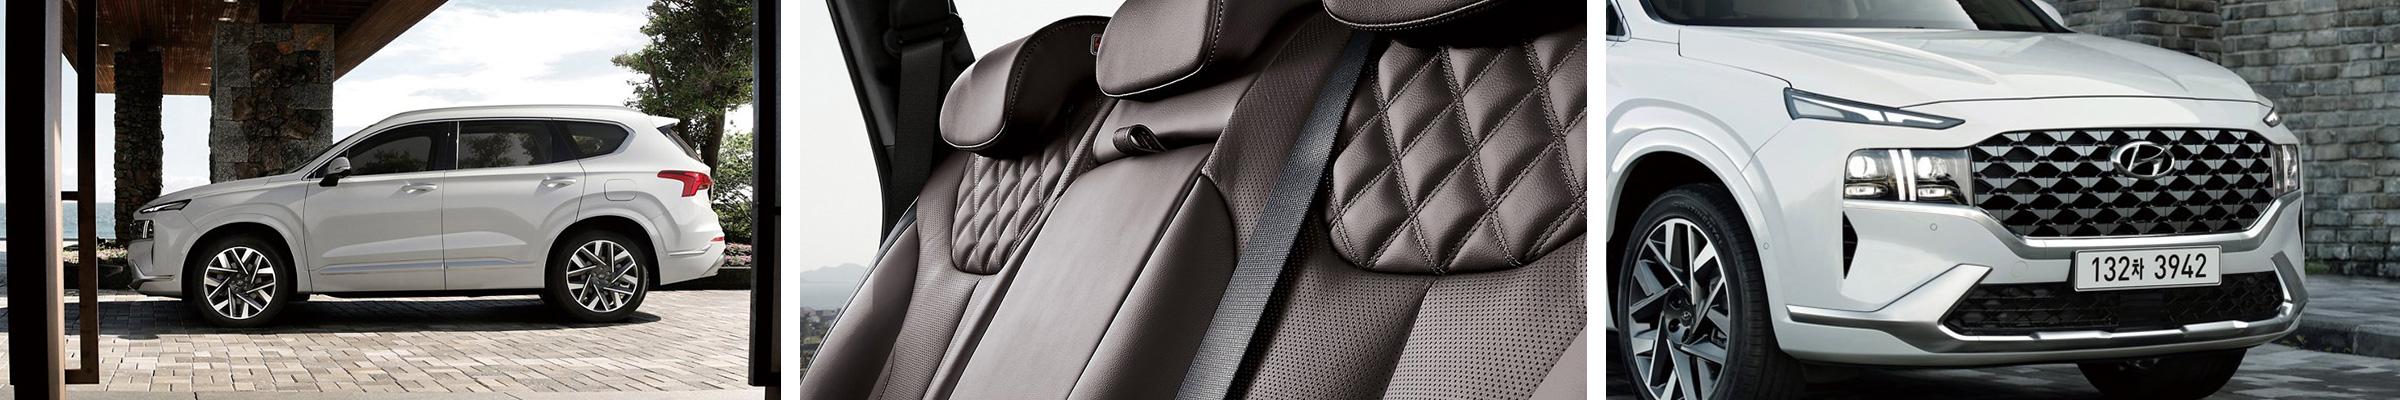 2021 Hyundai Santa Fe For Sale Dearborn MI | Detroit